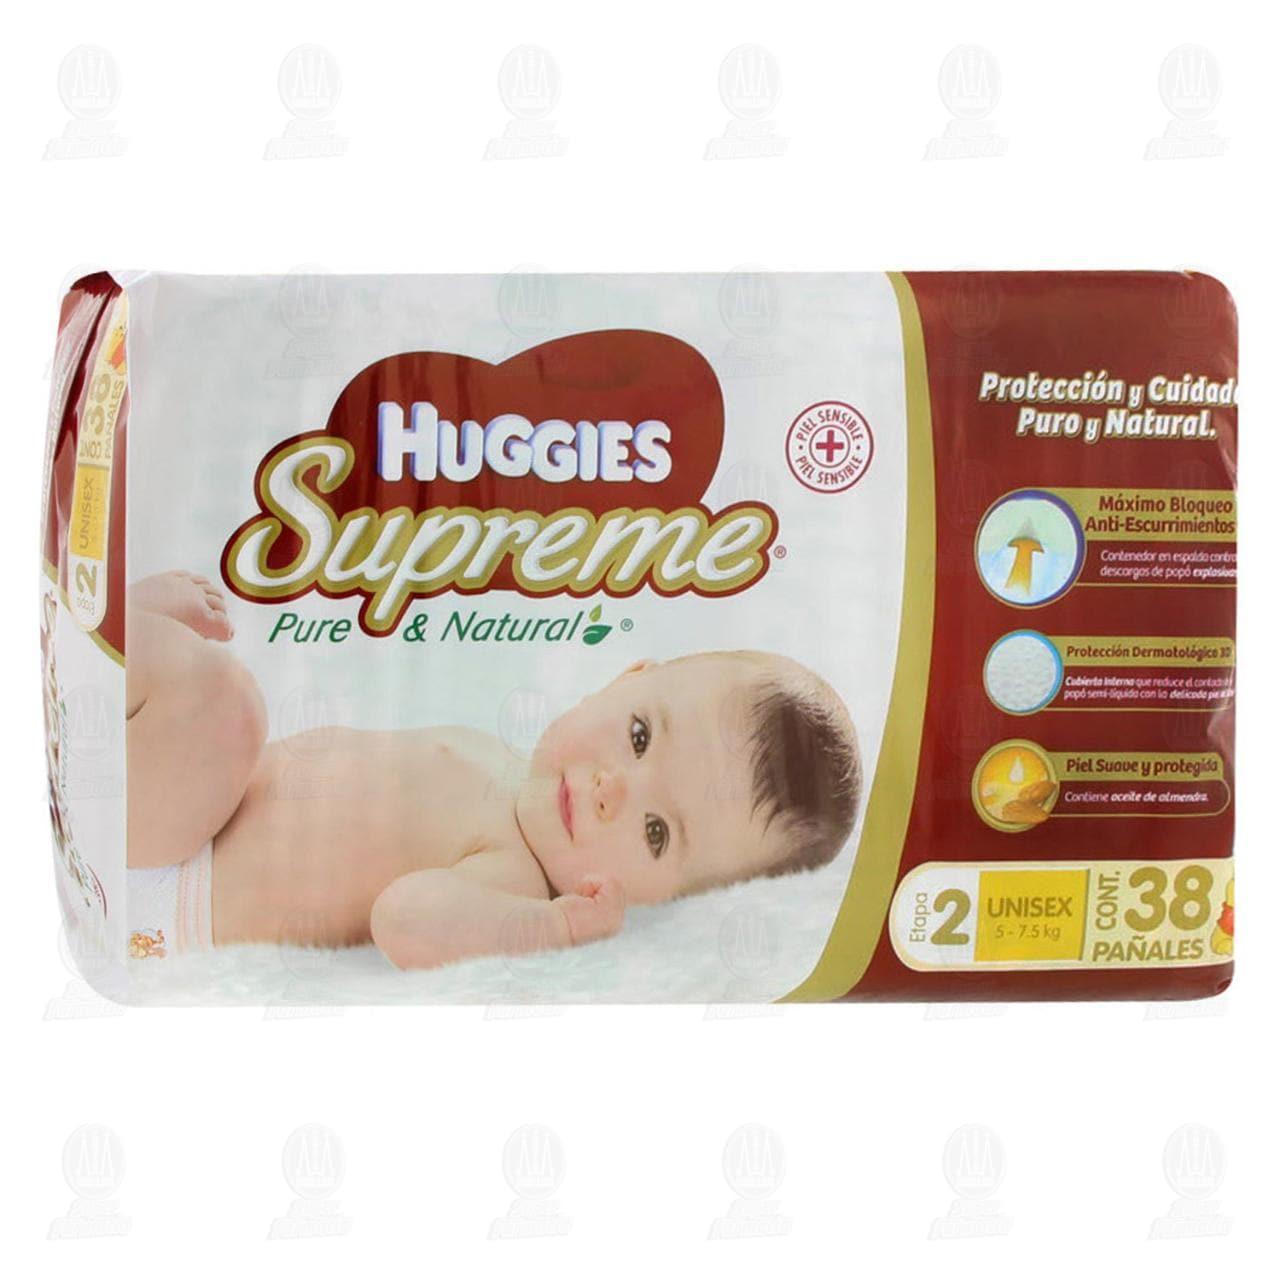 Pañales para Bebé Huggies Supreme Pure & Natural Unisex Etapa 2, 38 pzas.